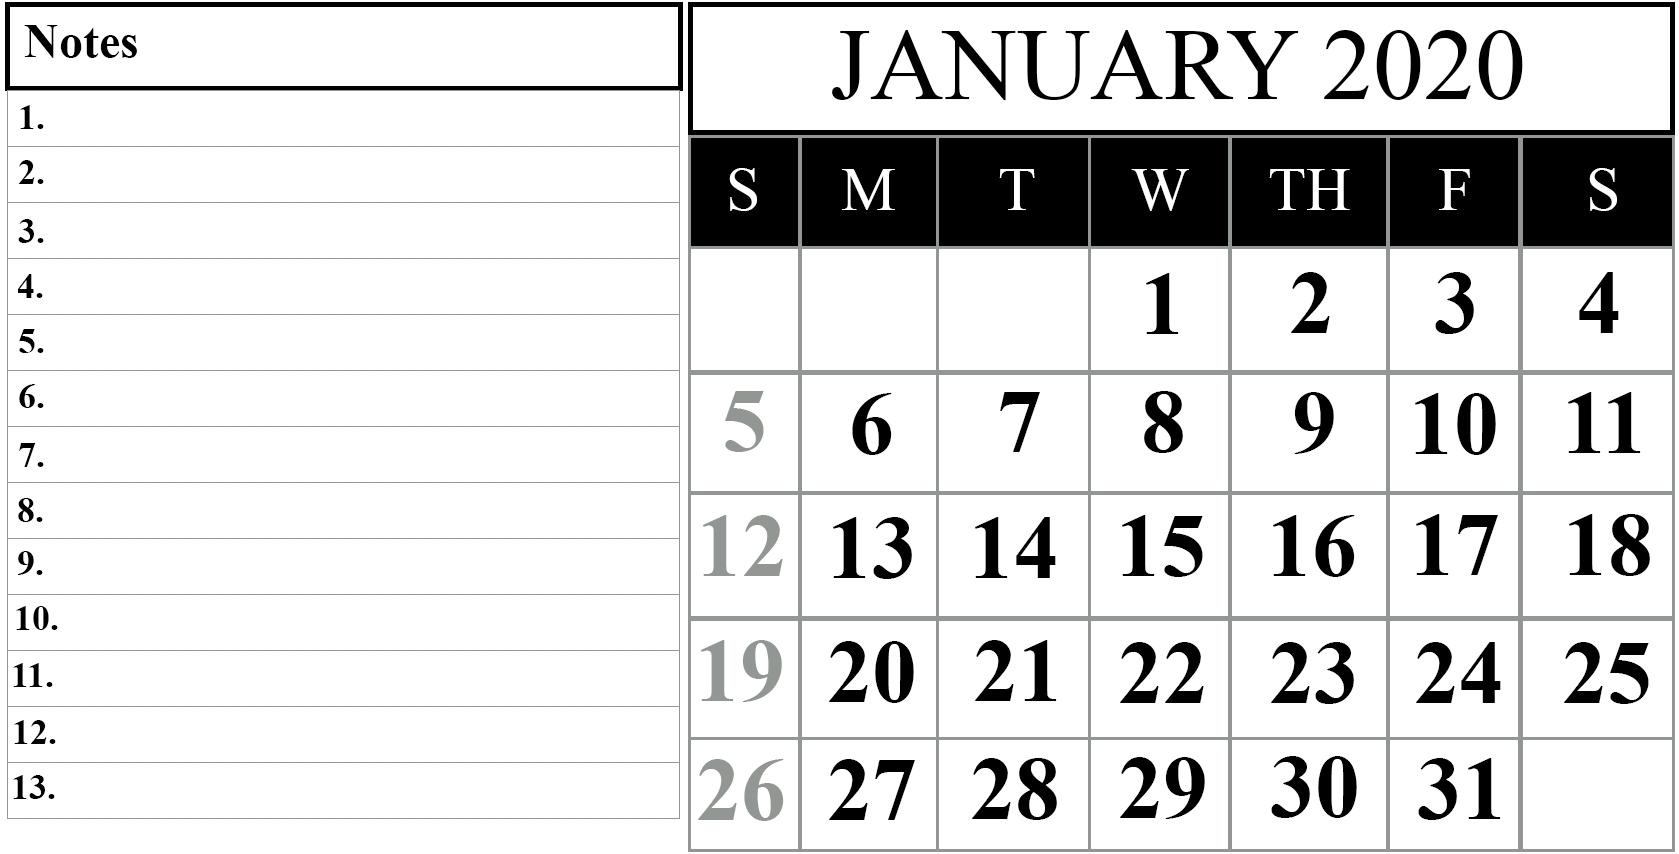 Free January 2020 Printable Calendar In Pdf, Excel & Word-January 2020 Calendar In Excel